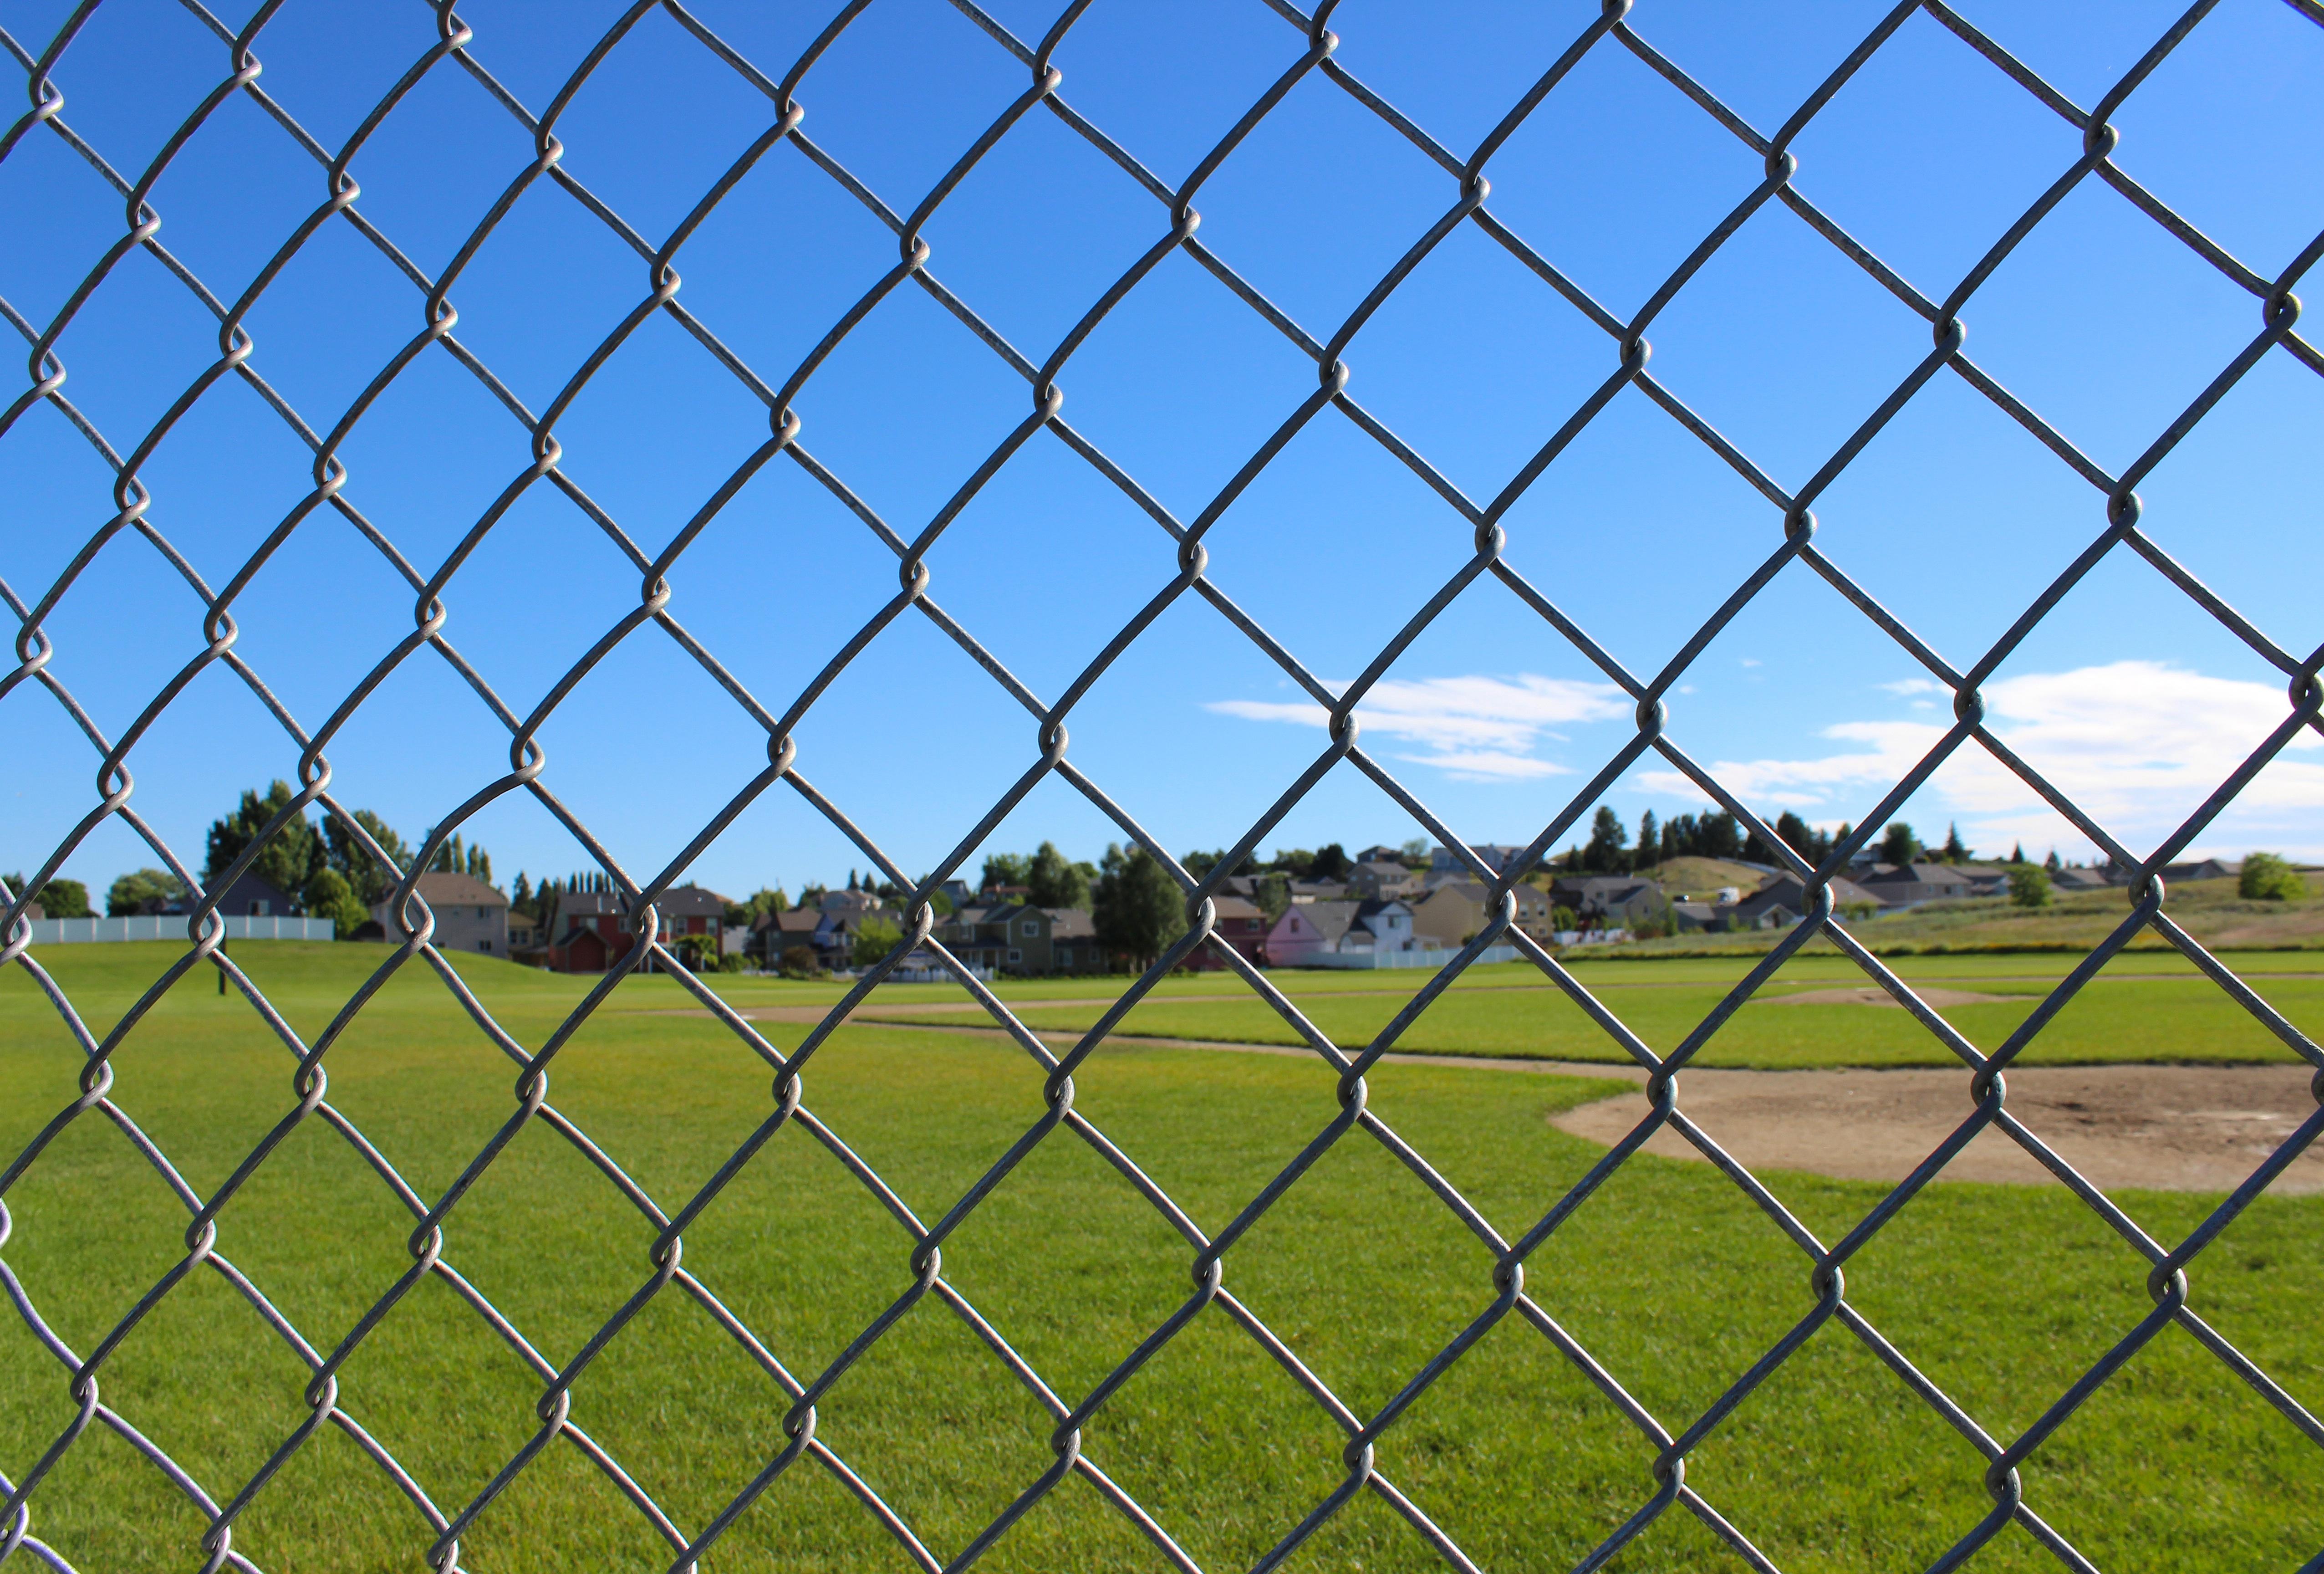 Free Images Fence Line Stadium Baseball Field Net